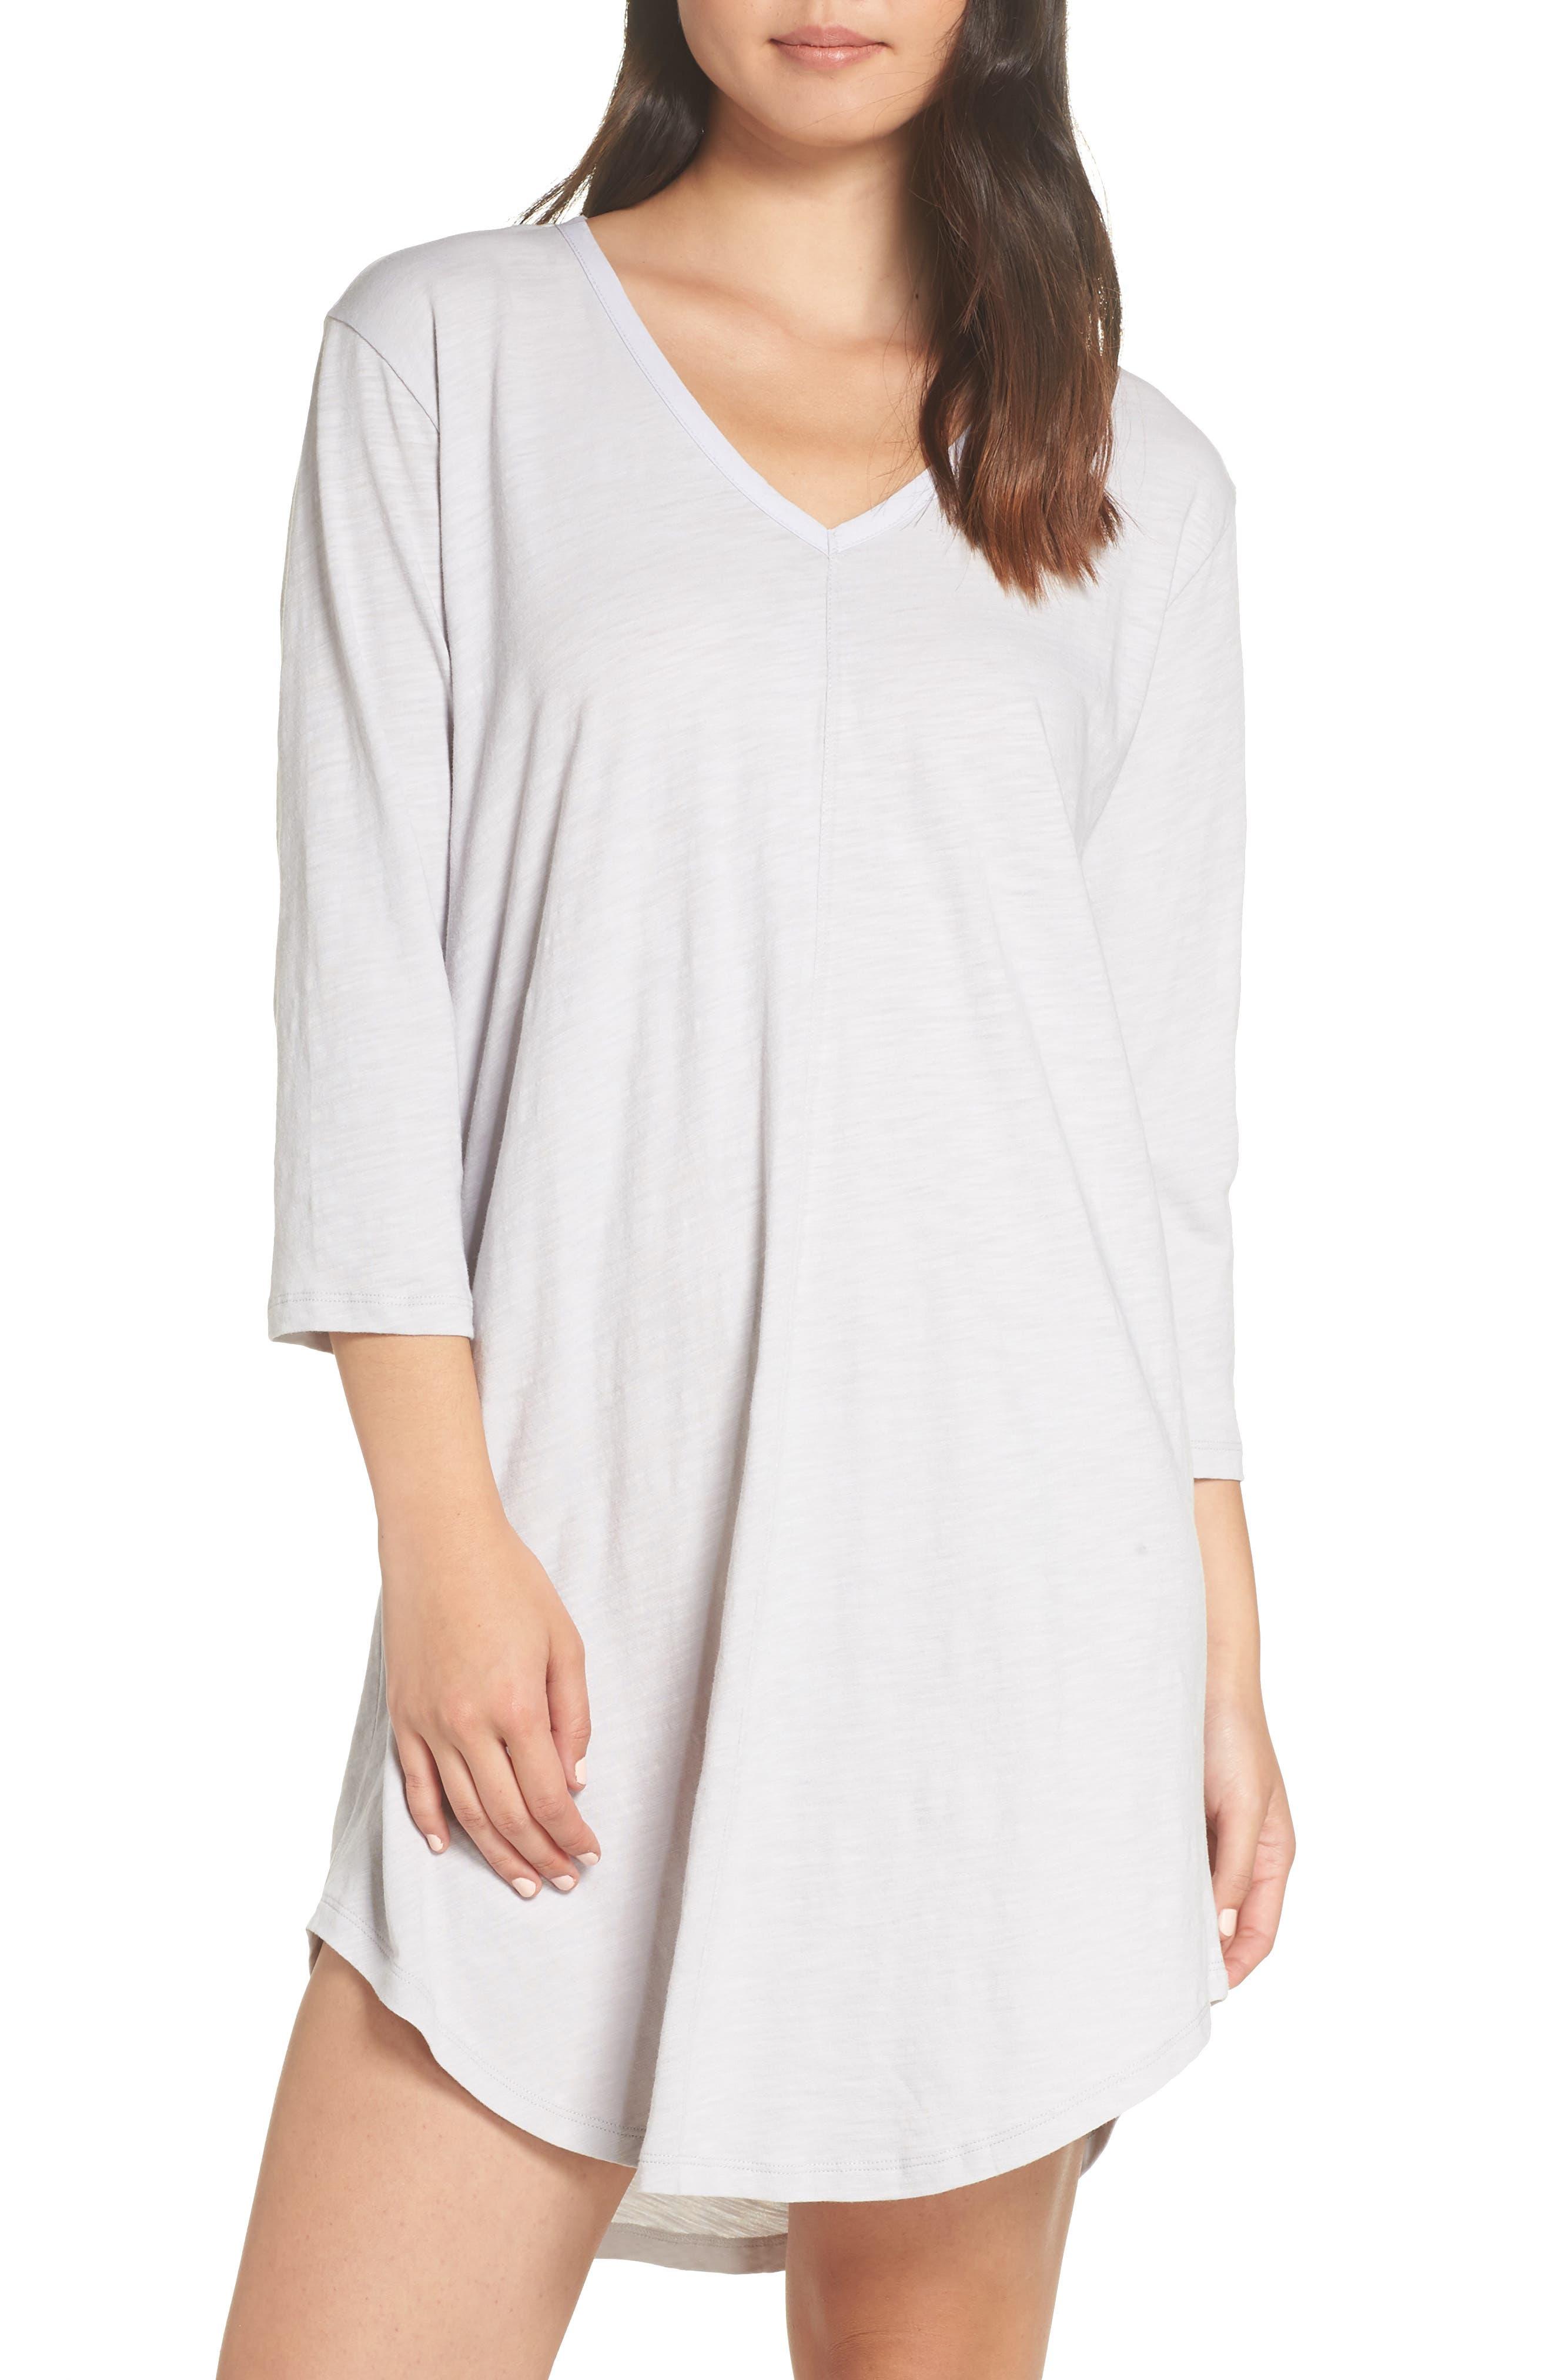 Naked Elements Sleep Shirt, Grey